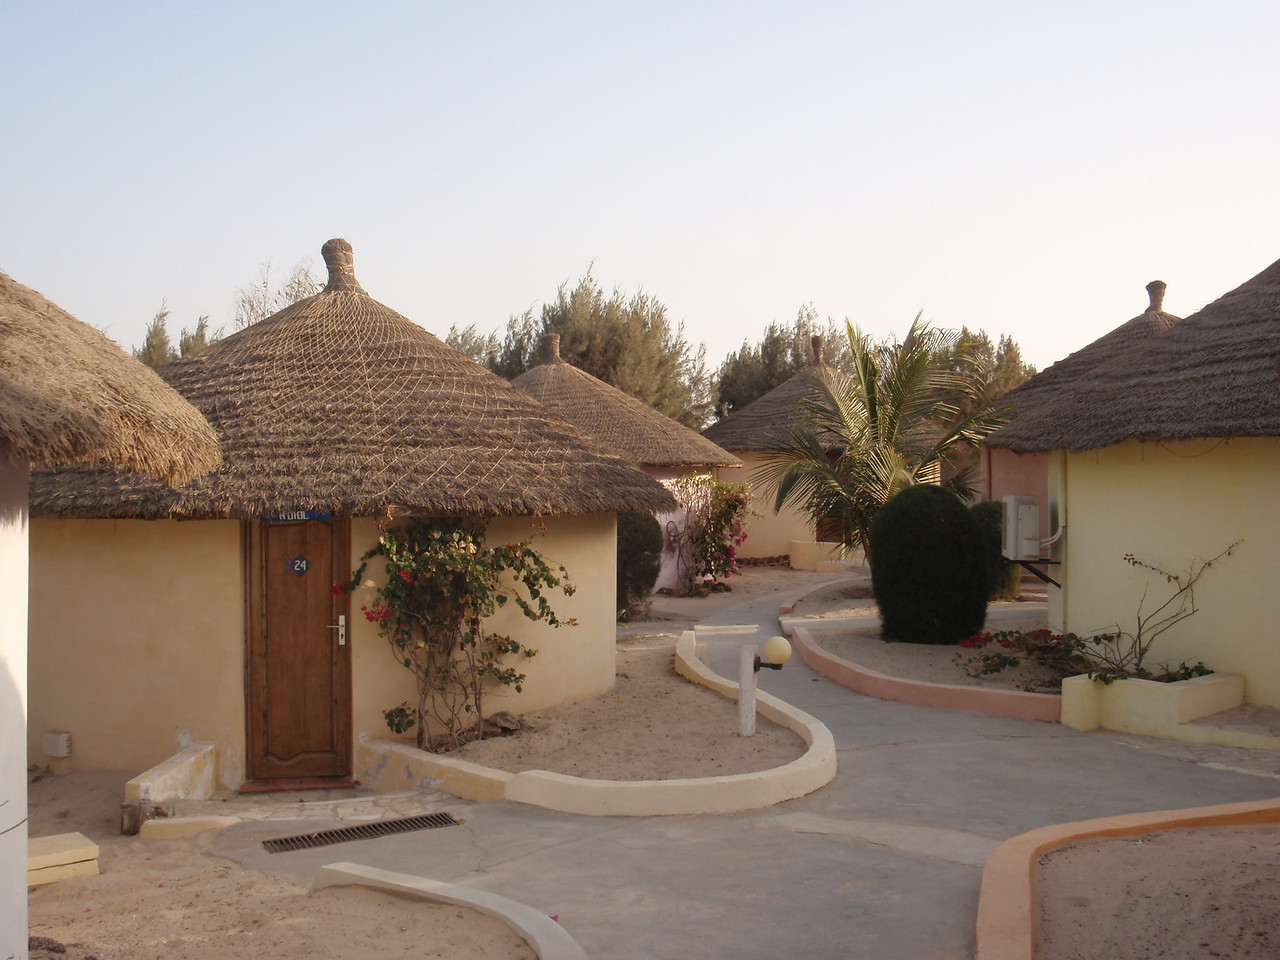 115_Langue de Barbarie Peninsula  Our Hotel-Resort  The Huts